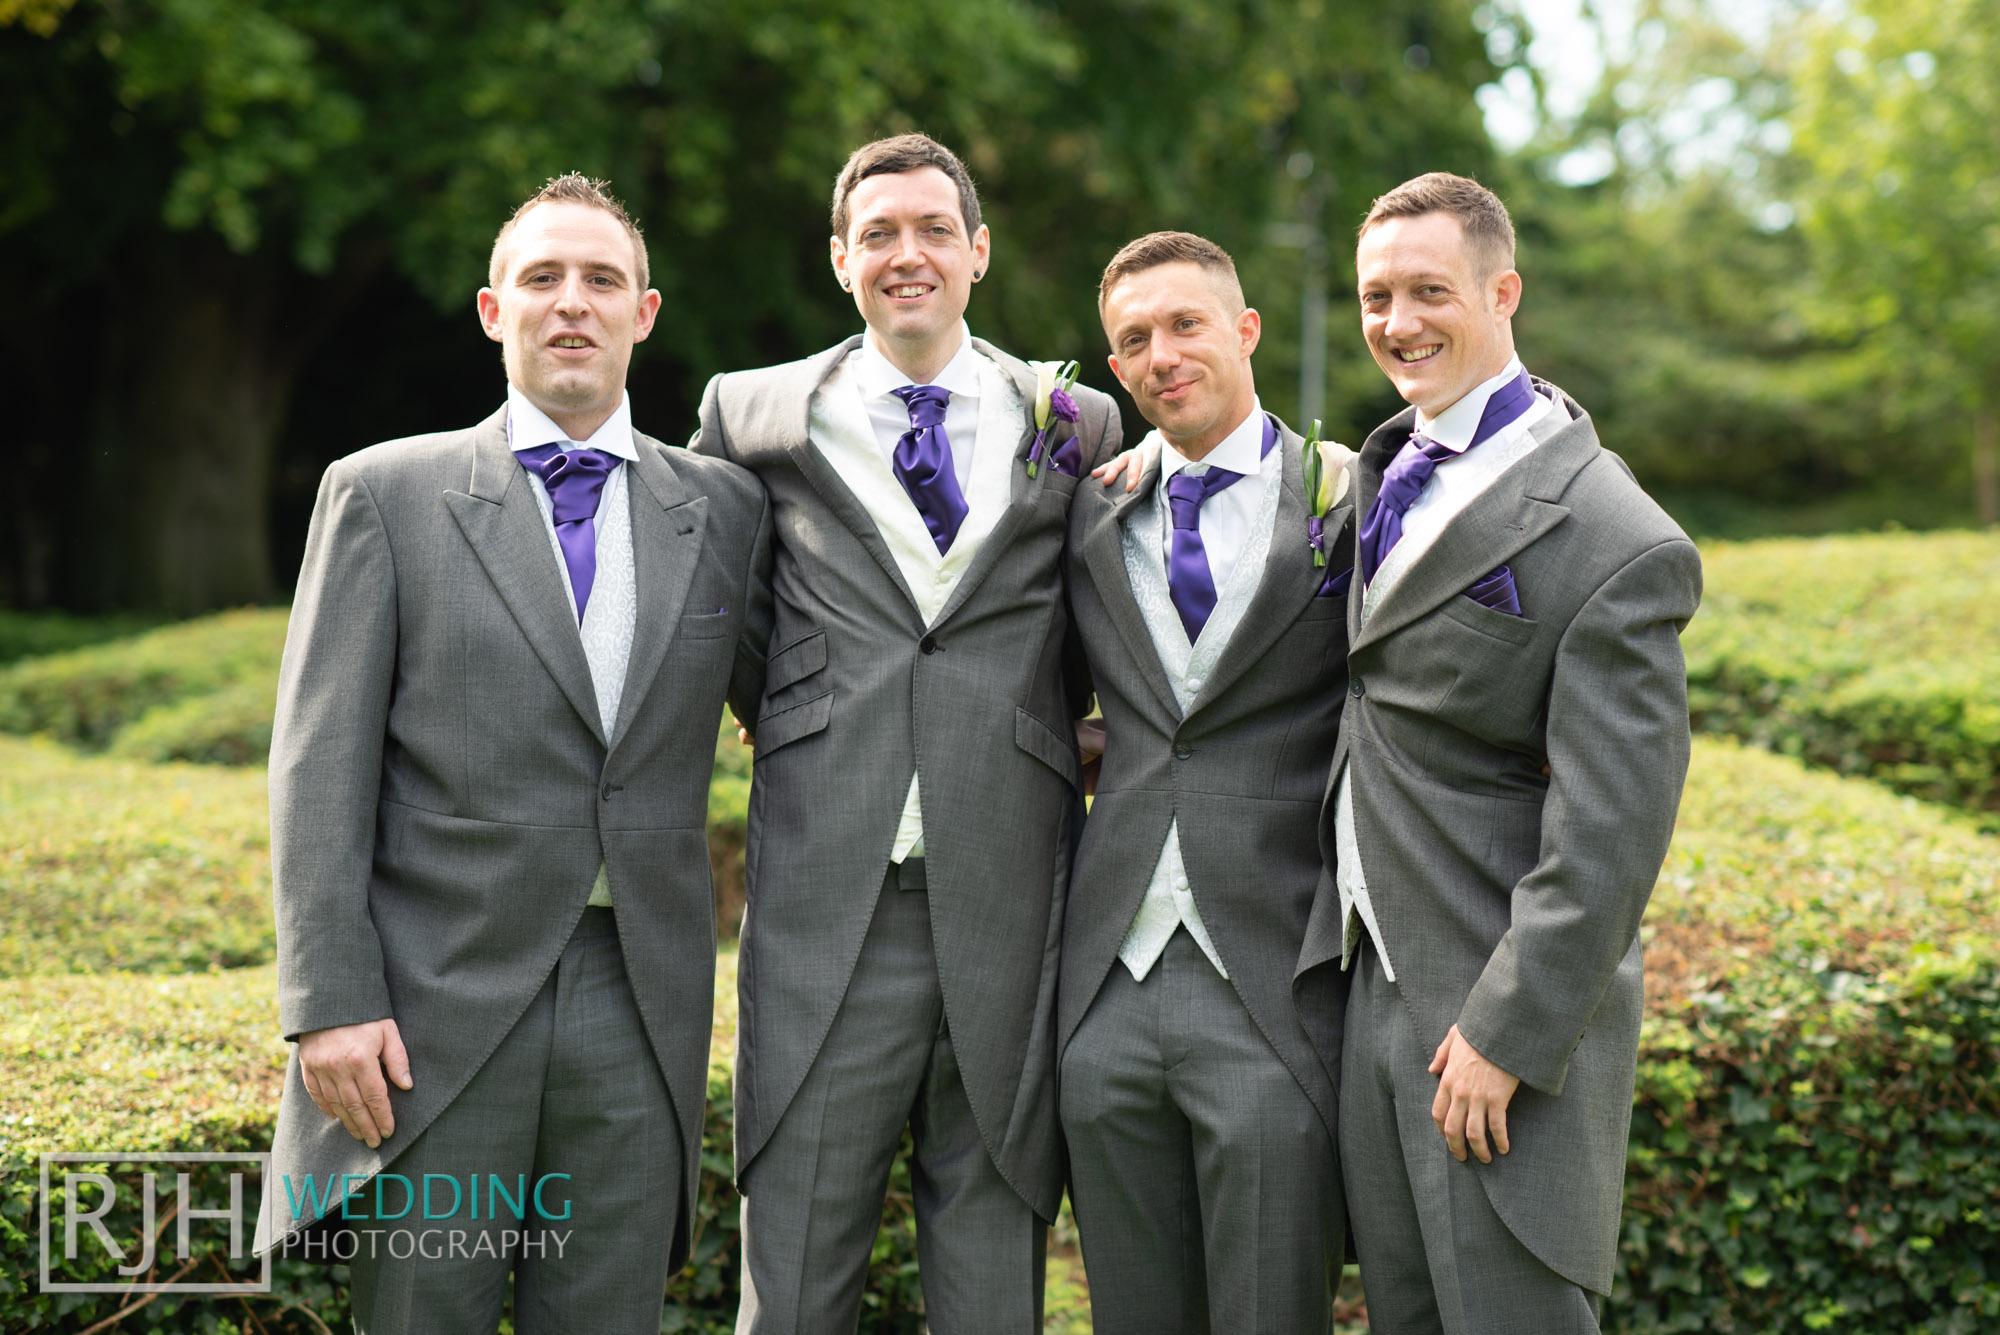 Oulton Hall Wedding Photography_Goodwill-Hall_006_DSC_2959.jpg